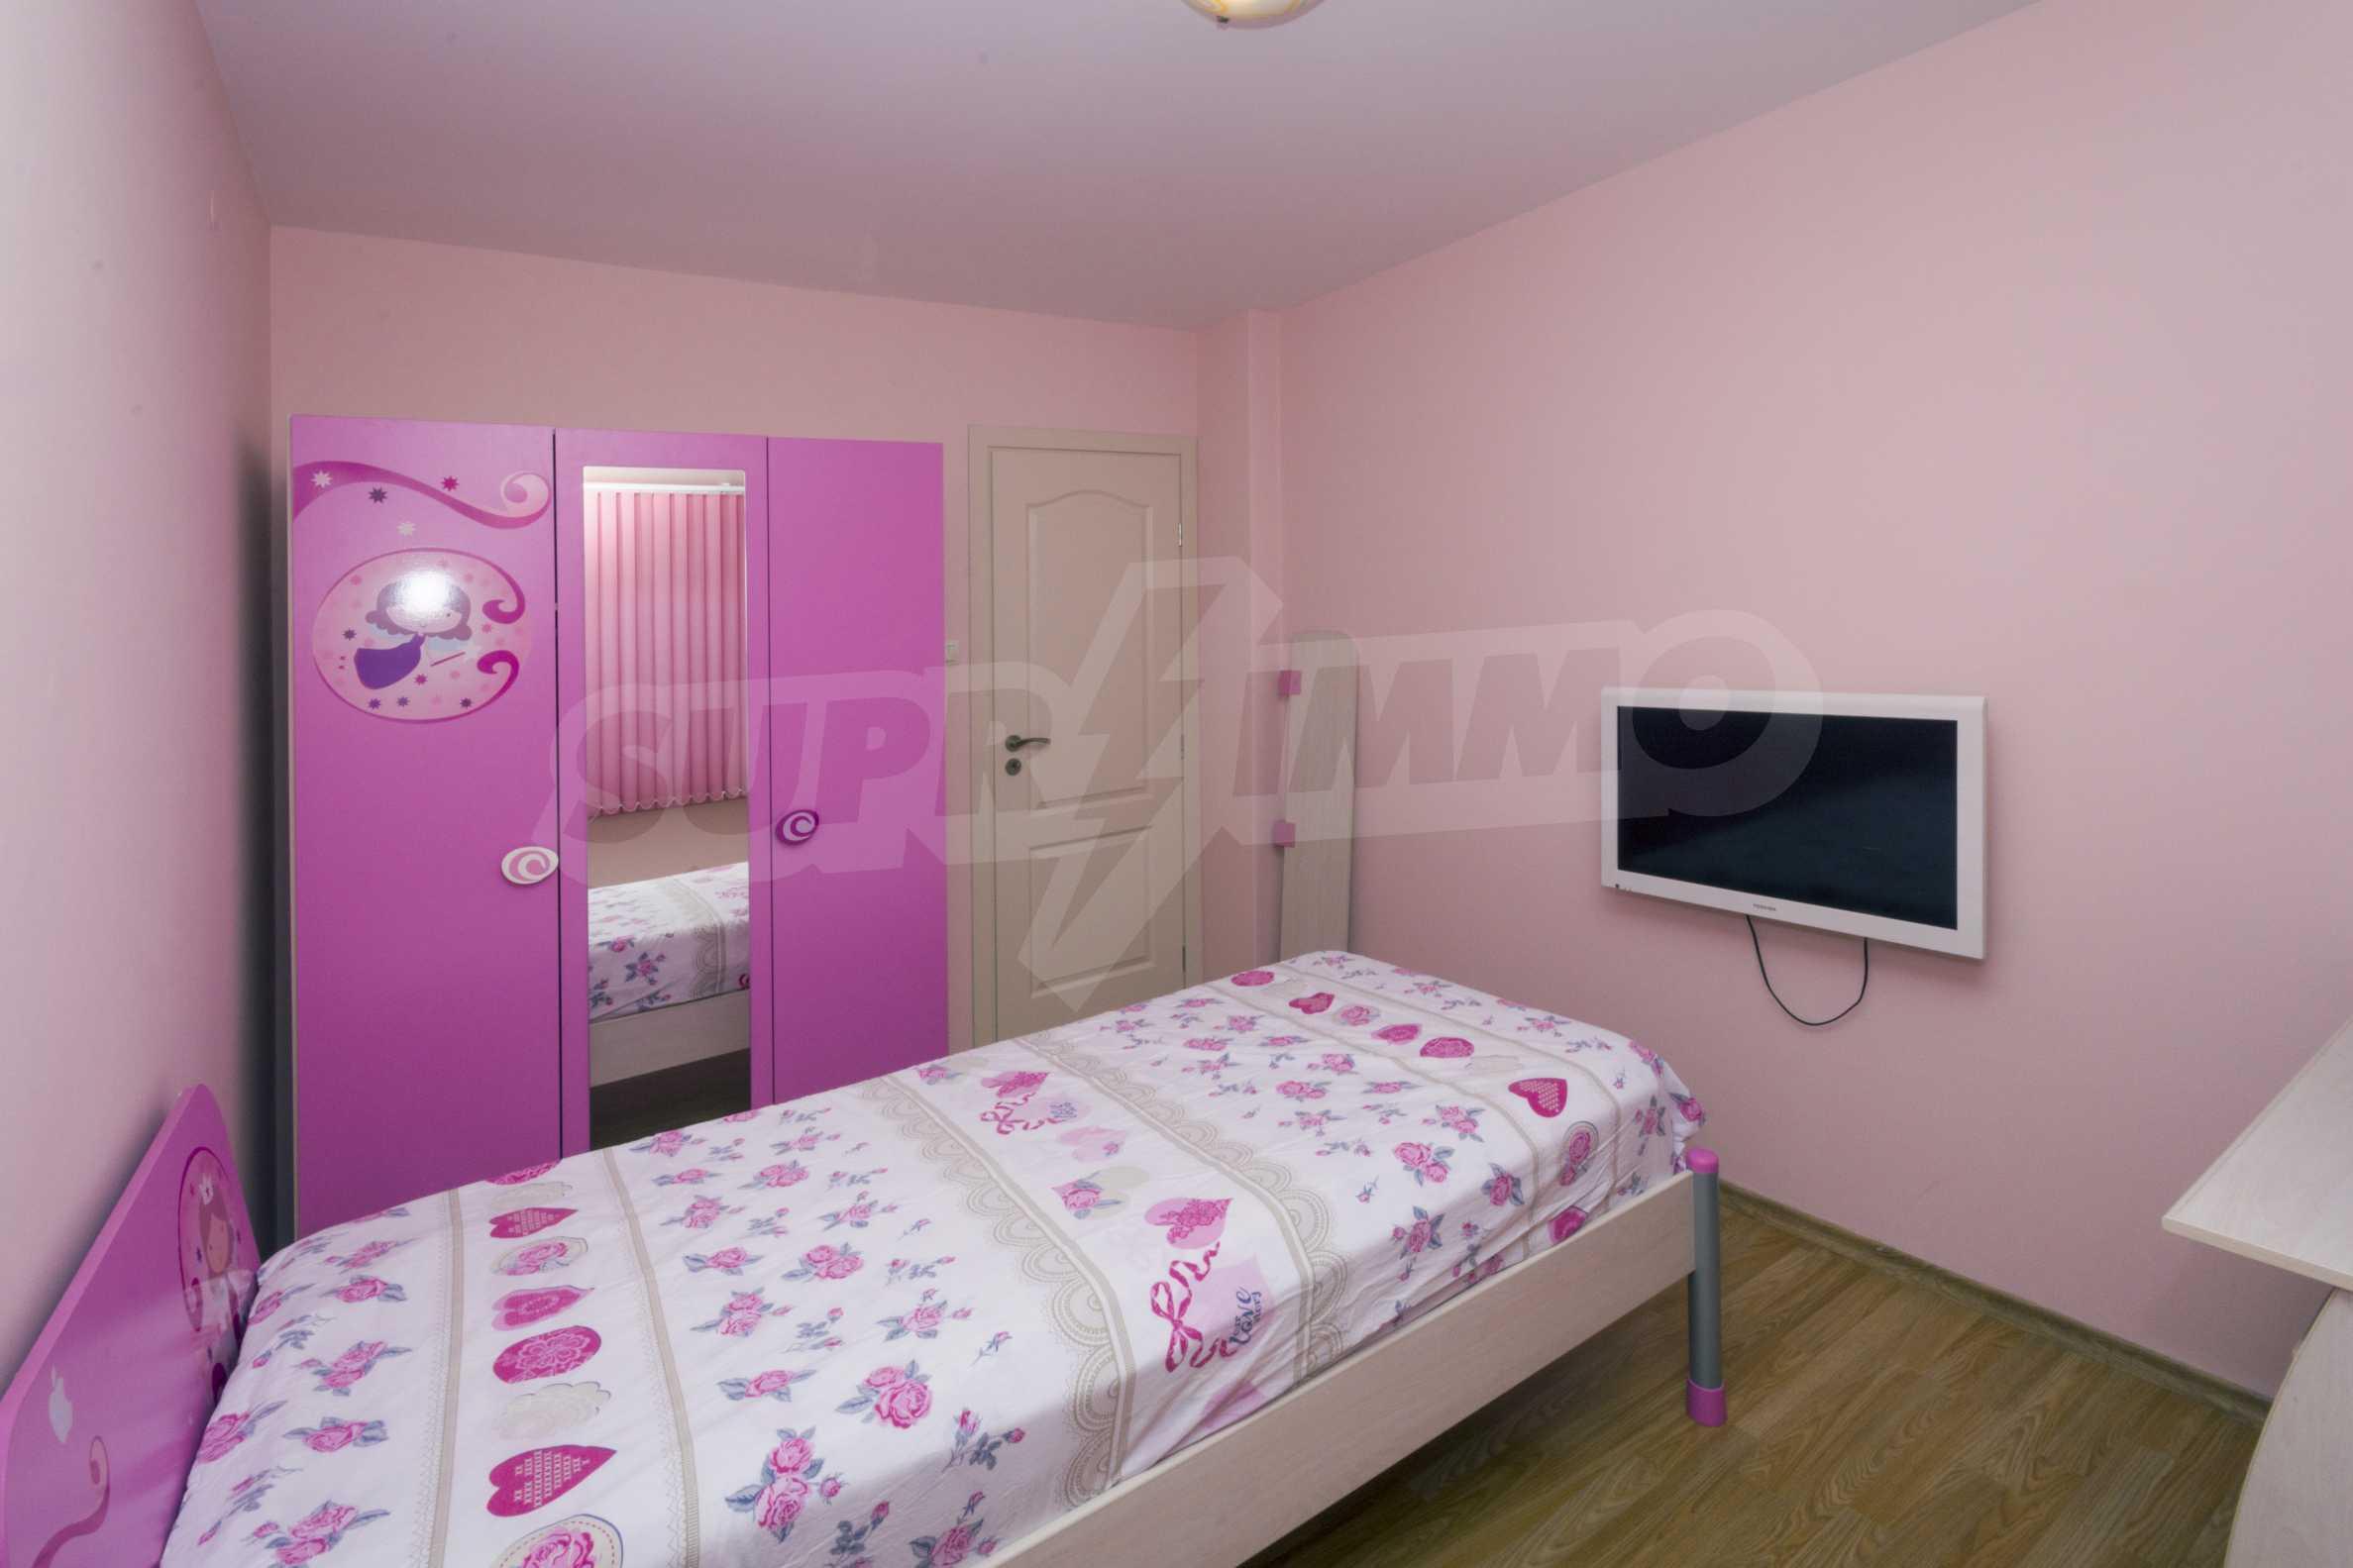 Многостаен апартамент до Гранд Хотел Пловдив 9